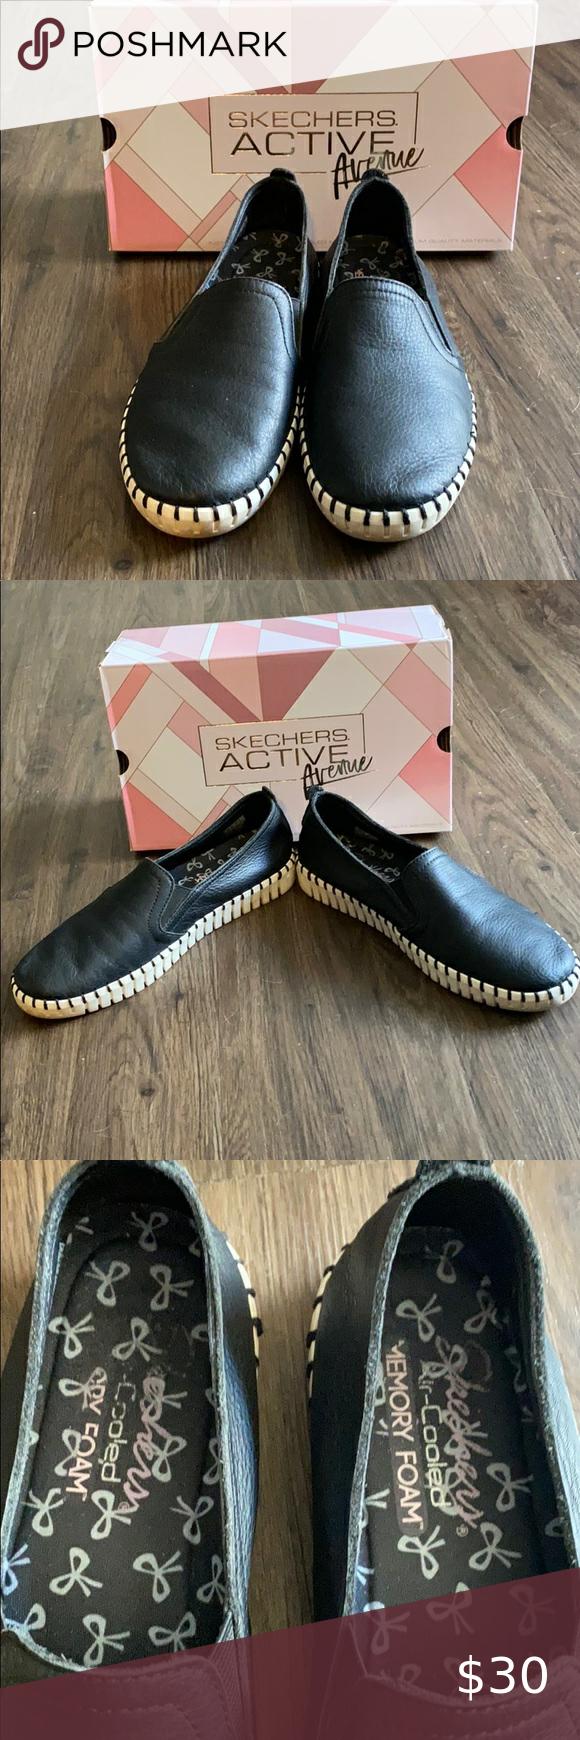 Skechers ACTIVE Avenue slip on loafer